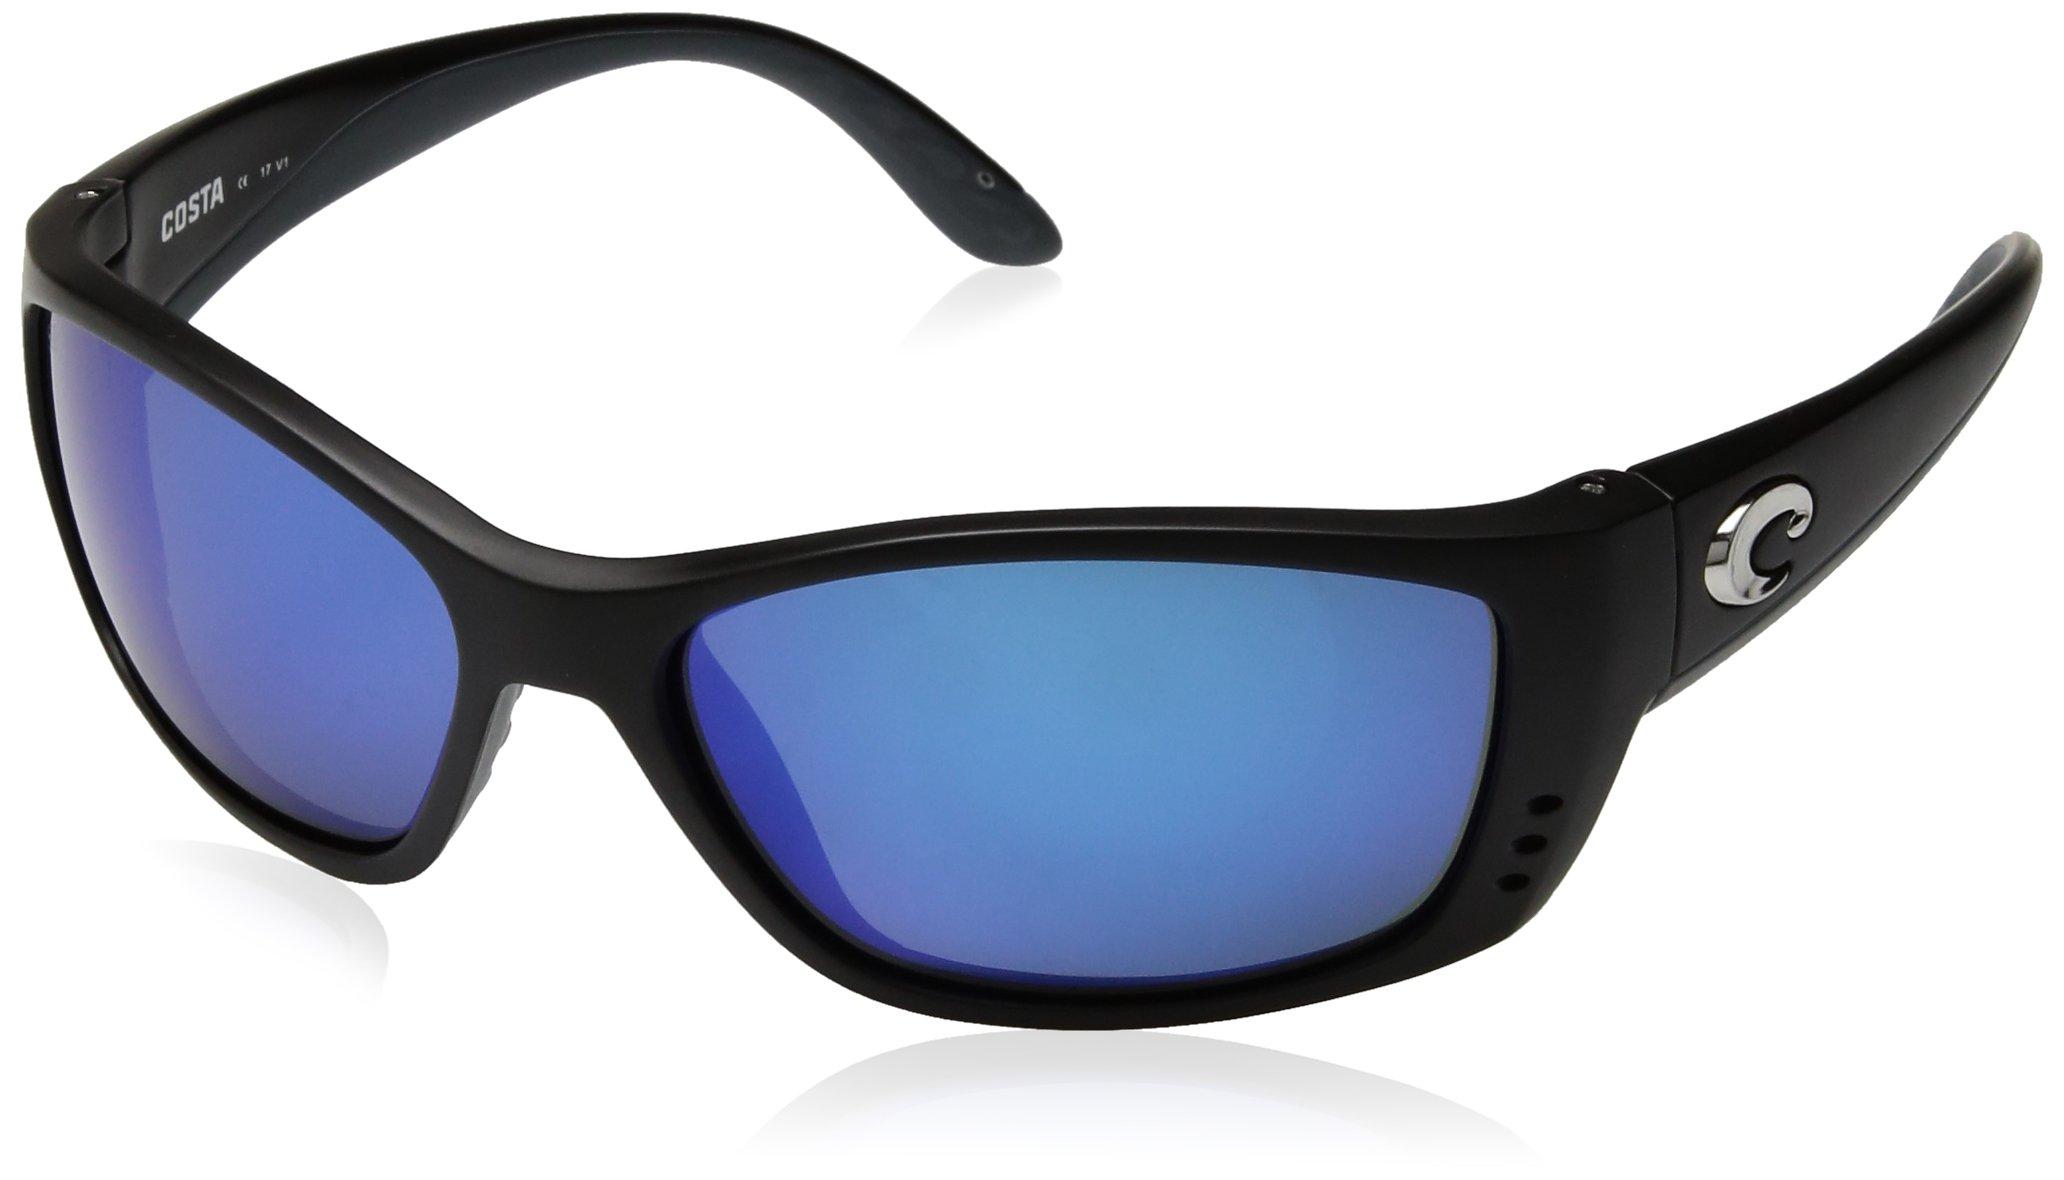 Costa del Mar Unisex-Adult Fisch FS 11 OBMGLP Polarized Iridium Oval Sunglasses, black, 63.8 mm by Costa Del Mar